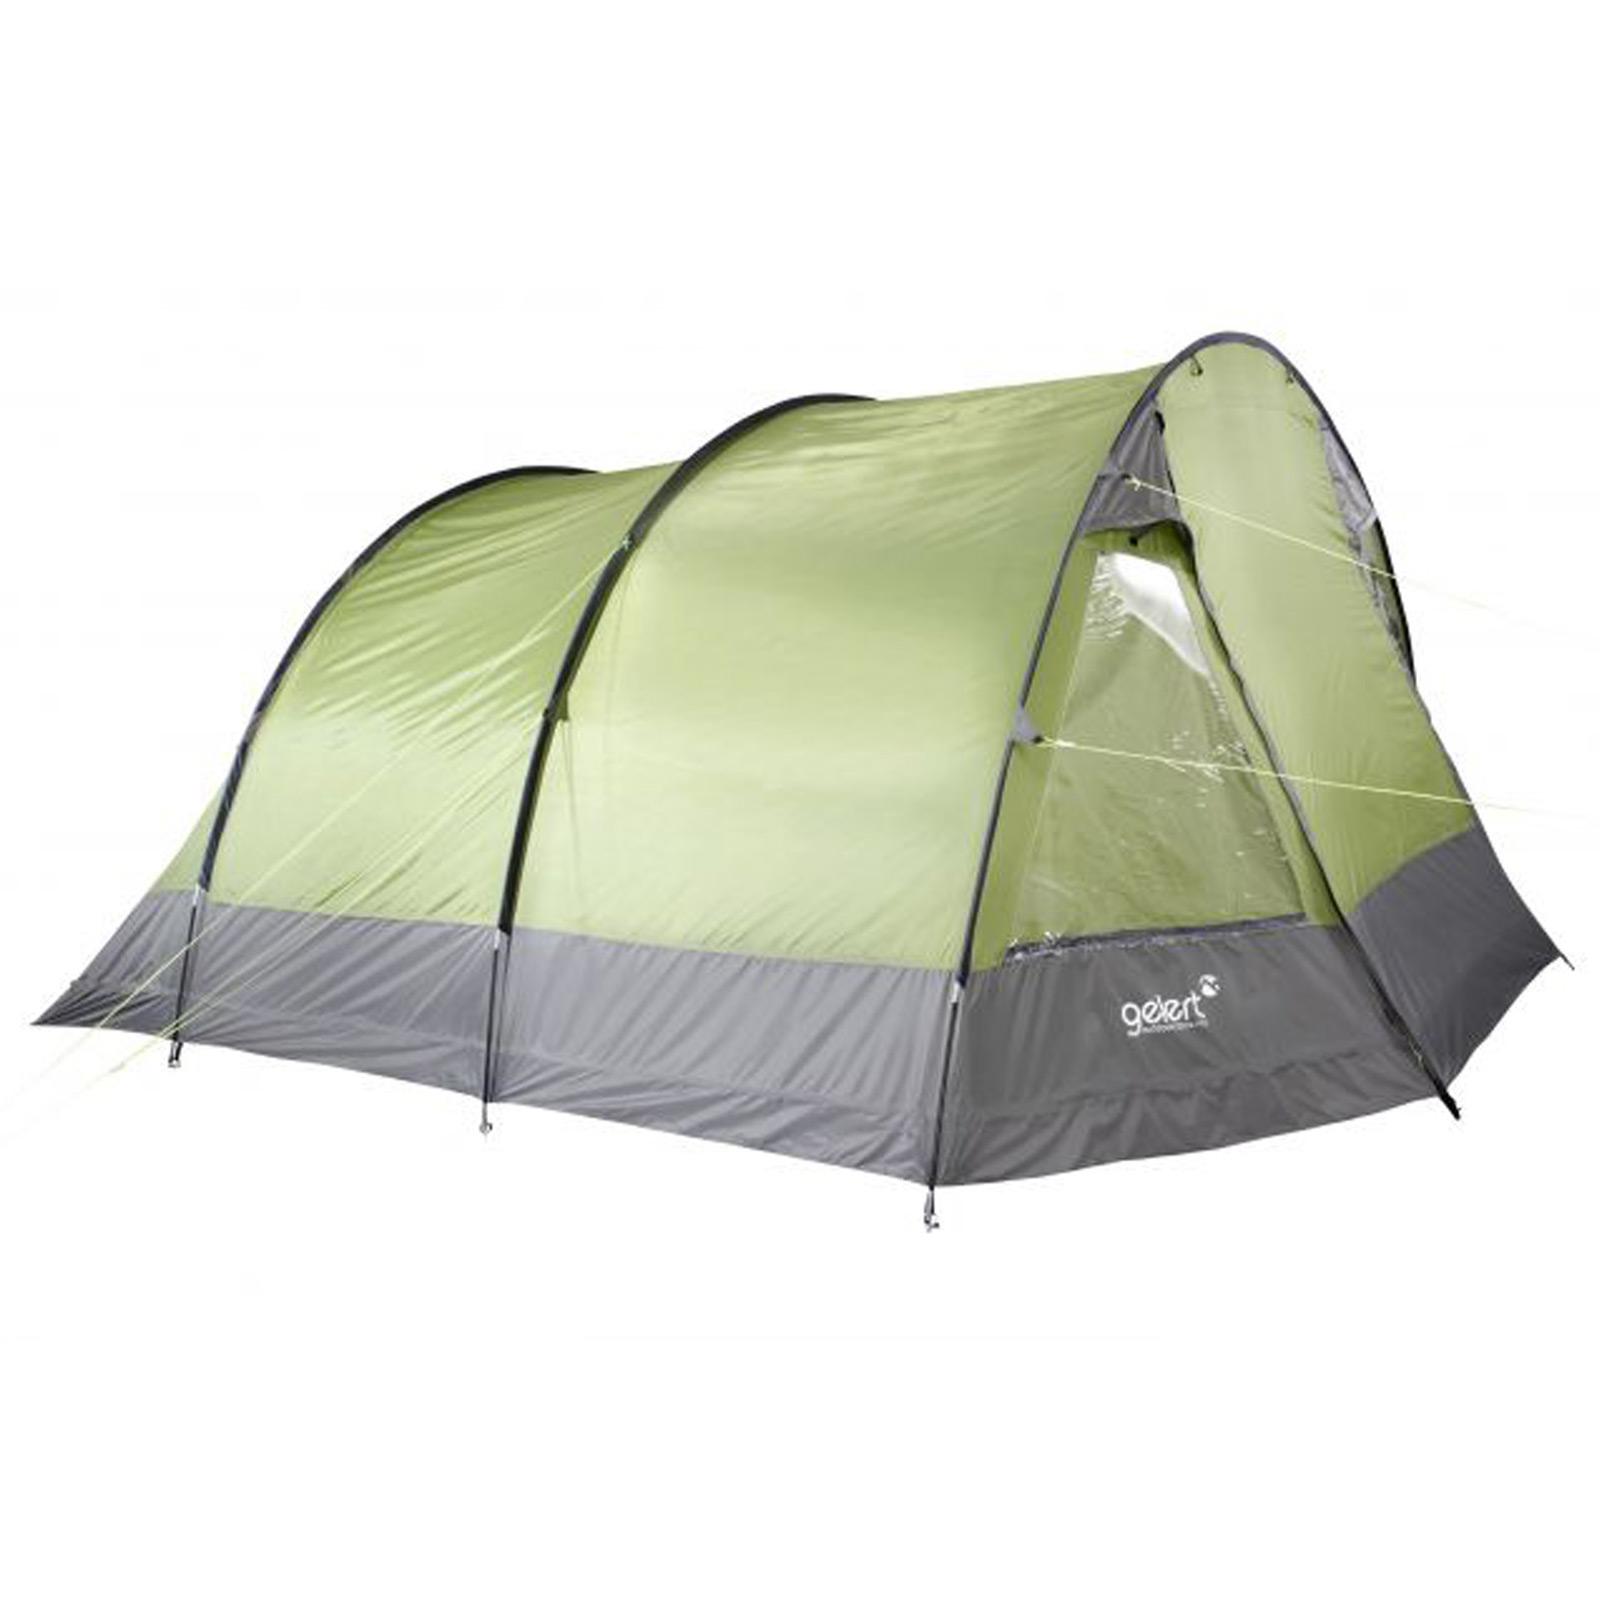 gelert corona 6 familienzelt camping zelt 4 5 6 personen insektenfrei neu ebay. Black Bedroom Furniture Sets. Home Design Ideas